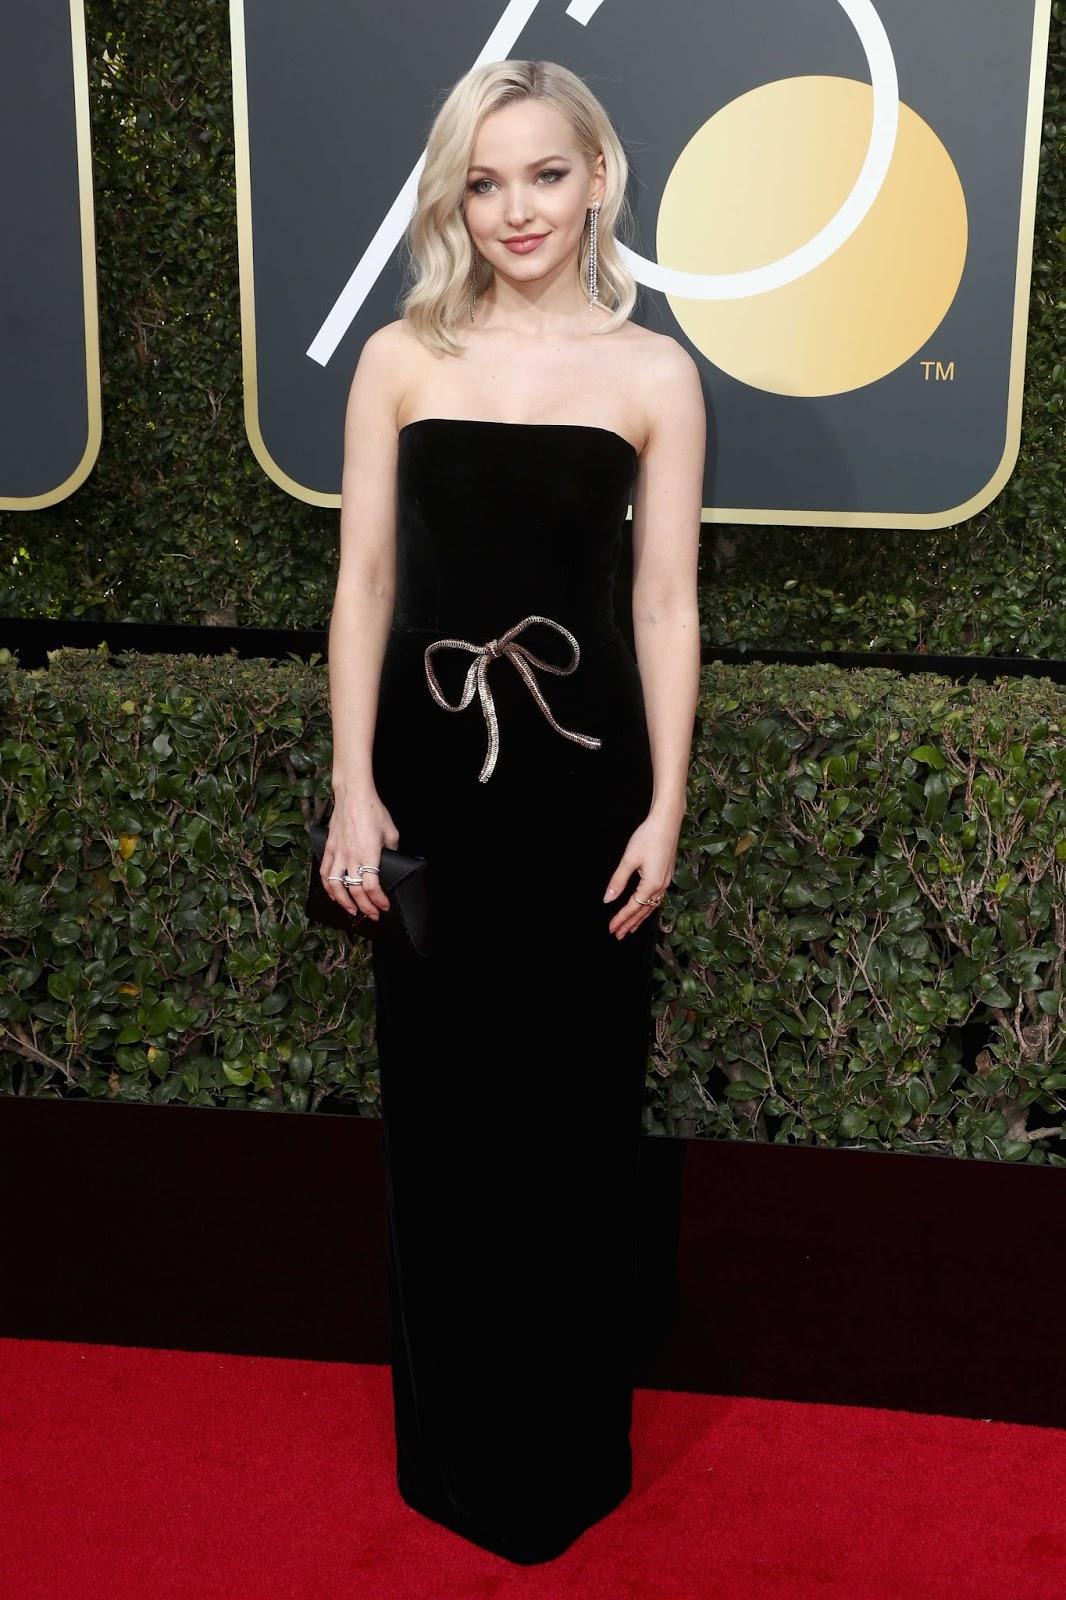 Dove Cameron Posing at 75th Annual Golden Globe Awards